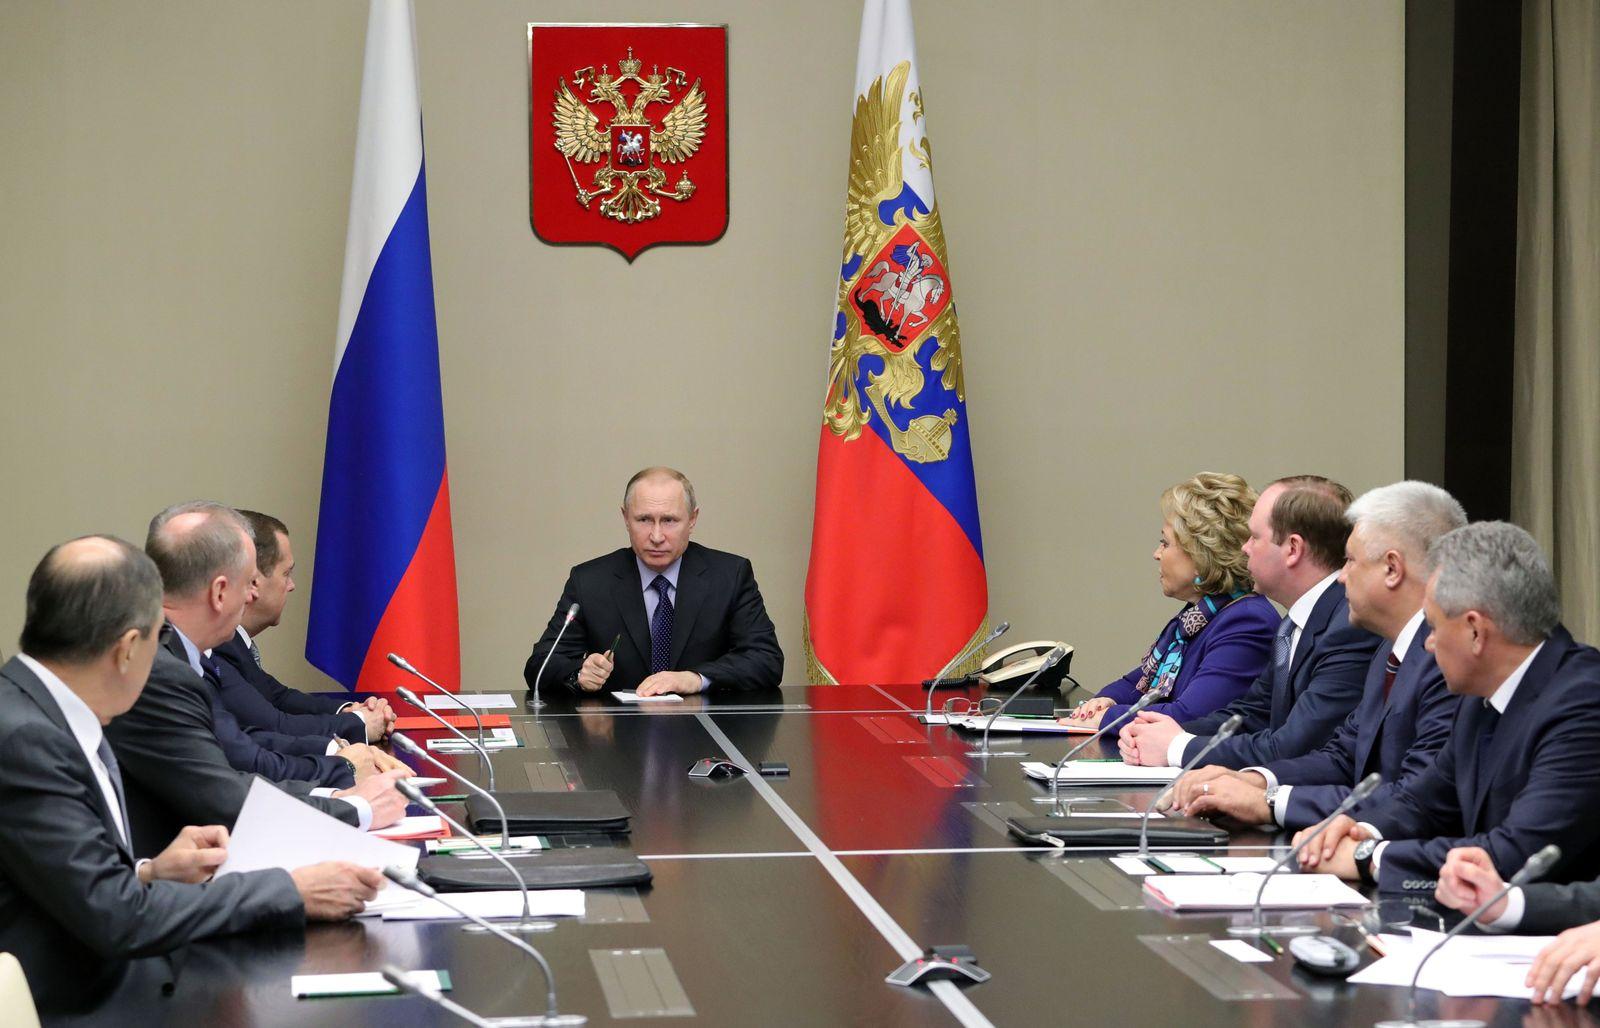 Russian President Putin chairs Russian Security Council meeting, Novo-Ogaryovo, Russian Federation - 19 Apr 2018